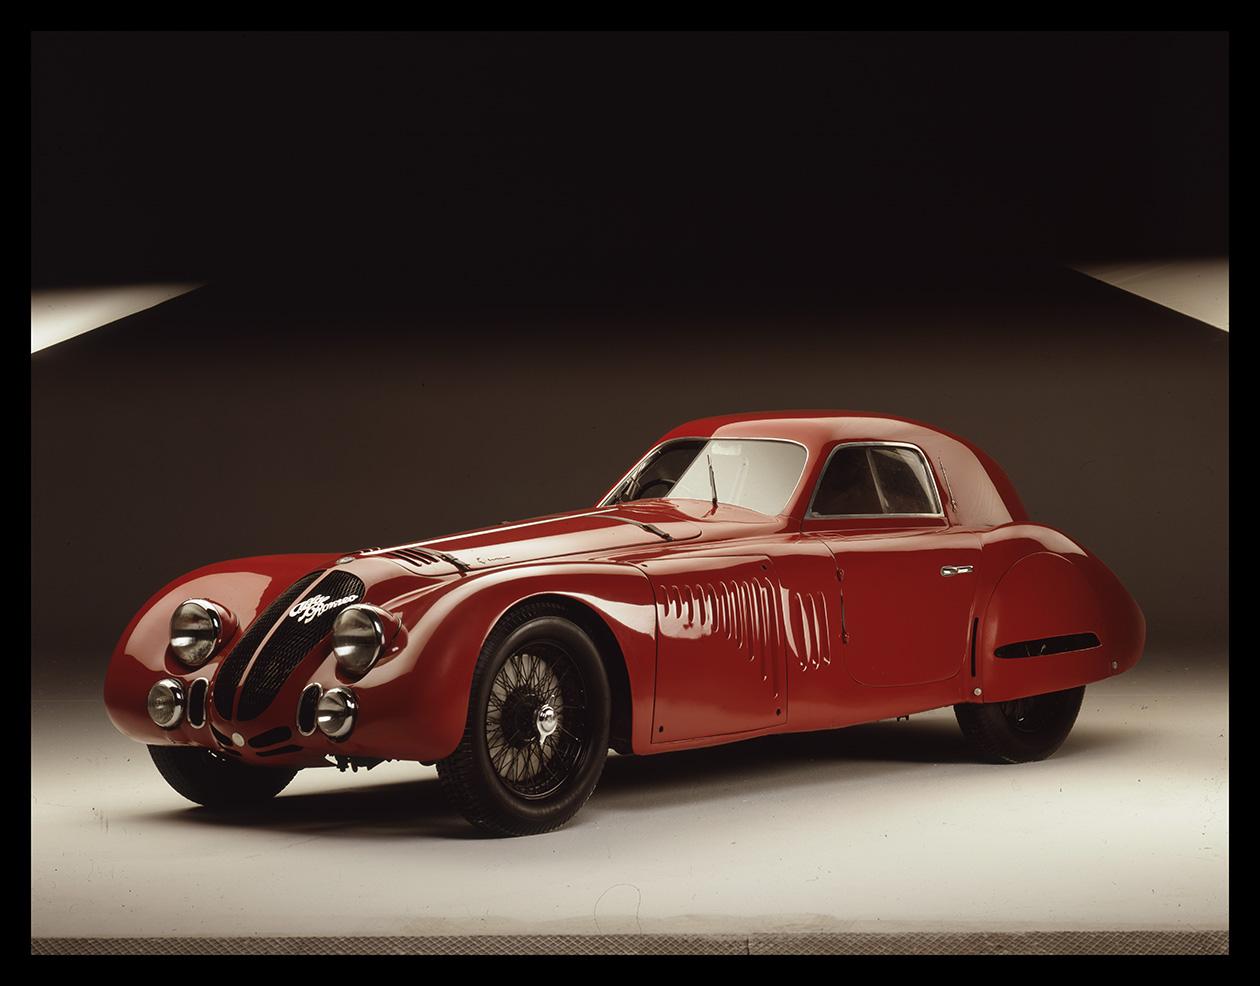 8c 2900 B Speciale Tipo Le Mans